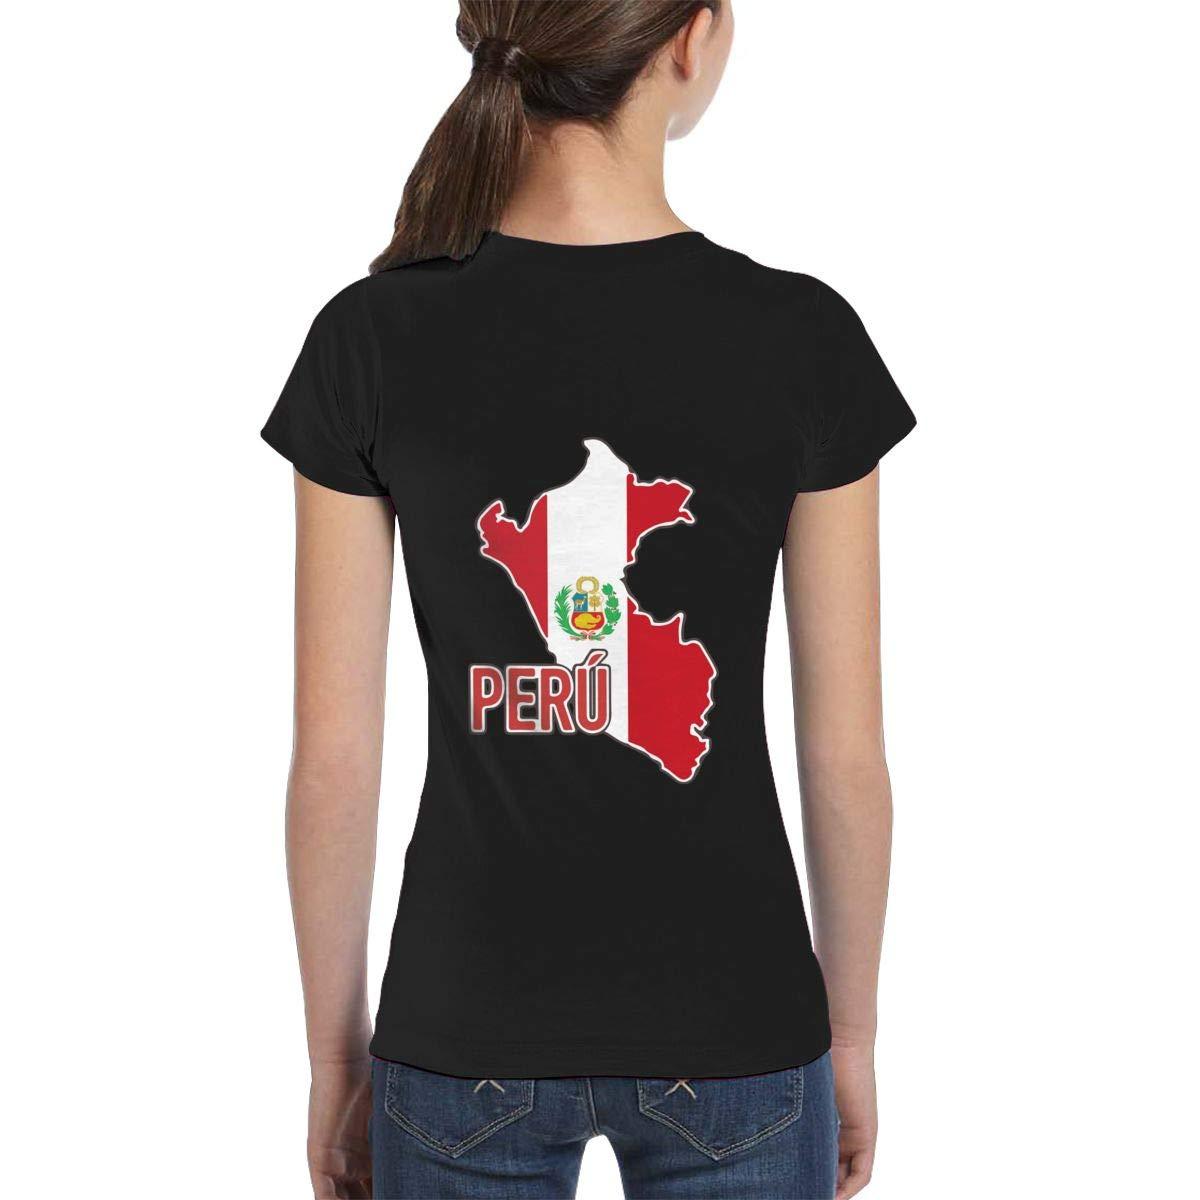 Fashion Tunic Shirt Dress XS-XL L6Nv4o@A Girls Short Sleeve Peruvian Pride Map of Peru Shirts